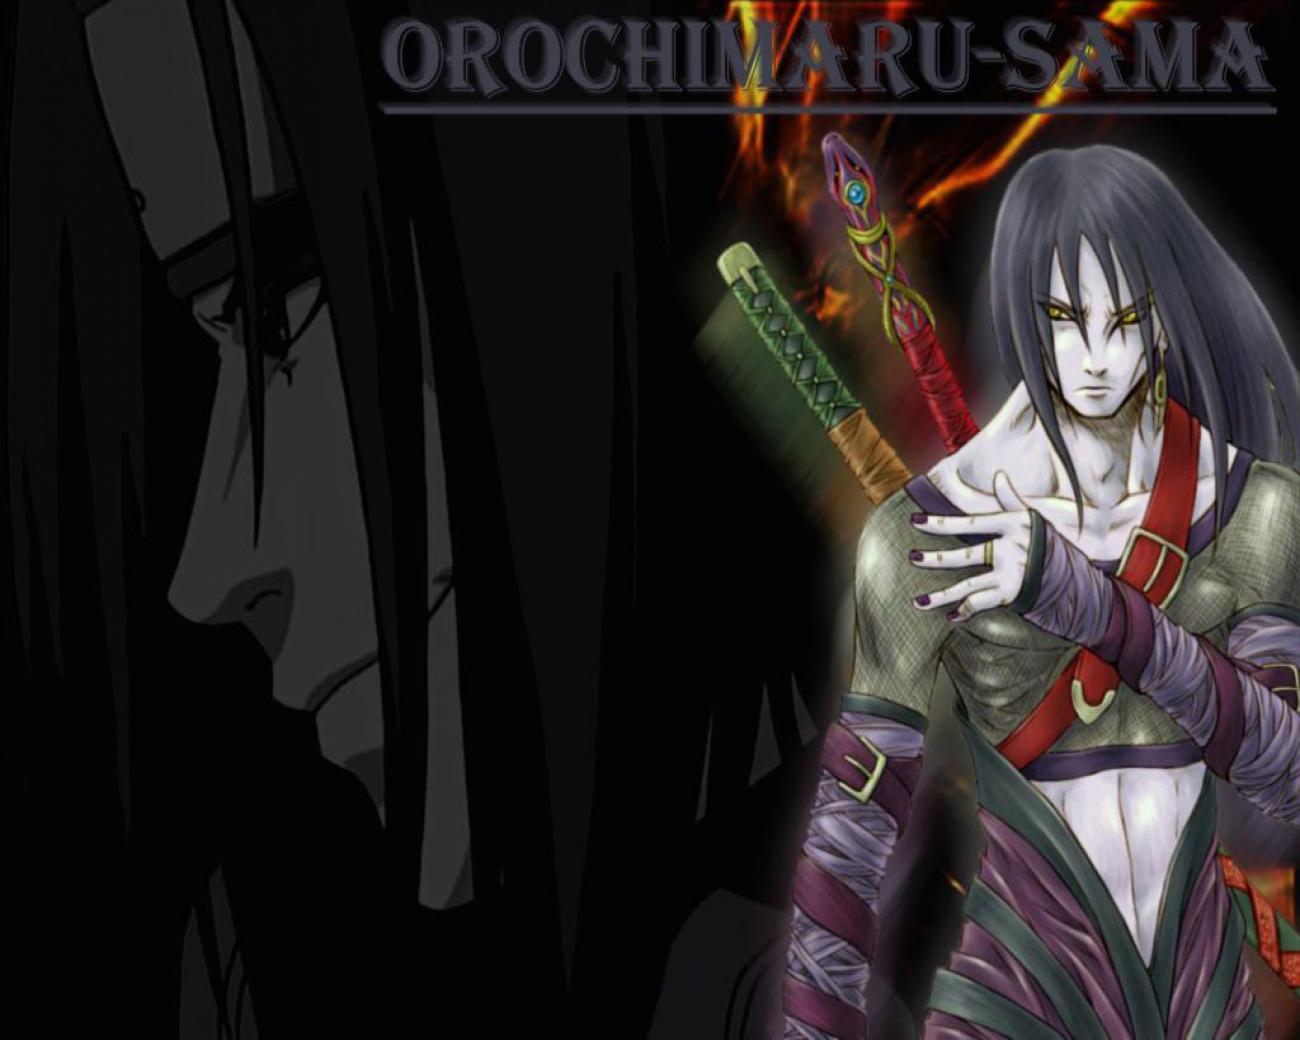 http://4.bp.blogspot.com/-_nQuEXV9BRw/UAq9pR2WWoI/AAAAAAAAAS8/QrgTu2bgdJ4/s1600/Orochimaru-Akatsuki-Naruto_large_High_Quality_Desktop_Wallpaper.jpg